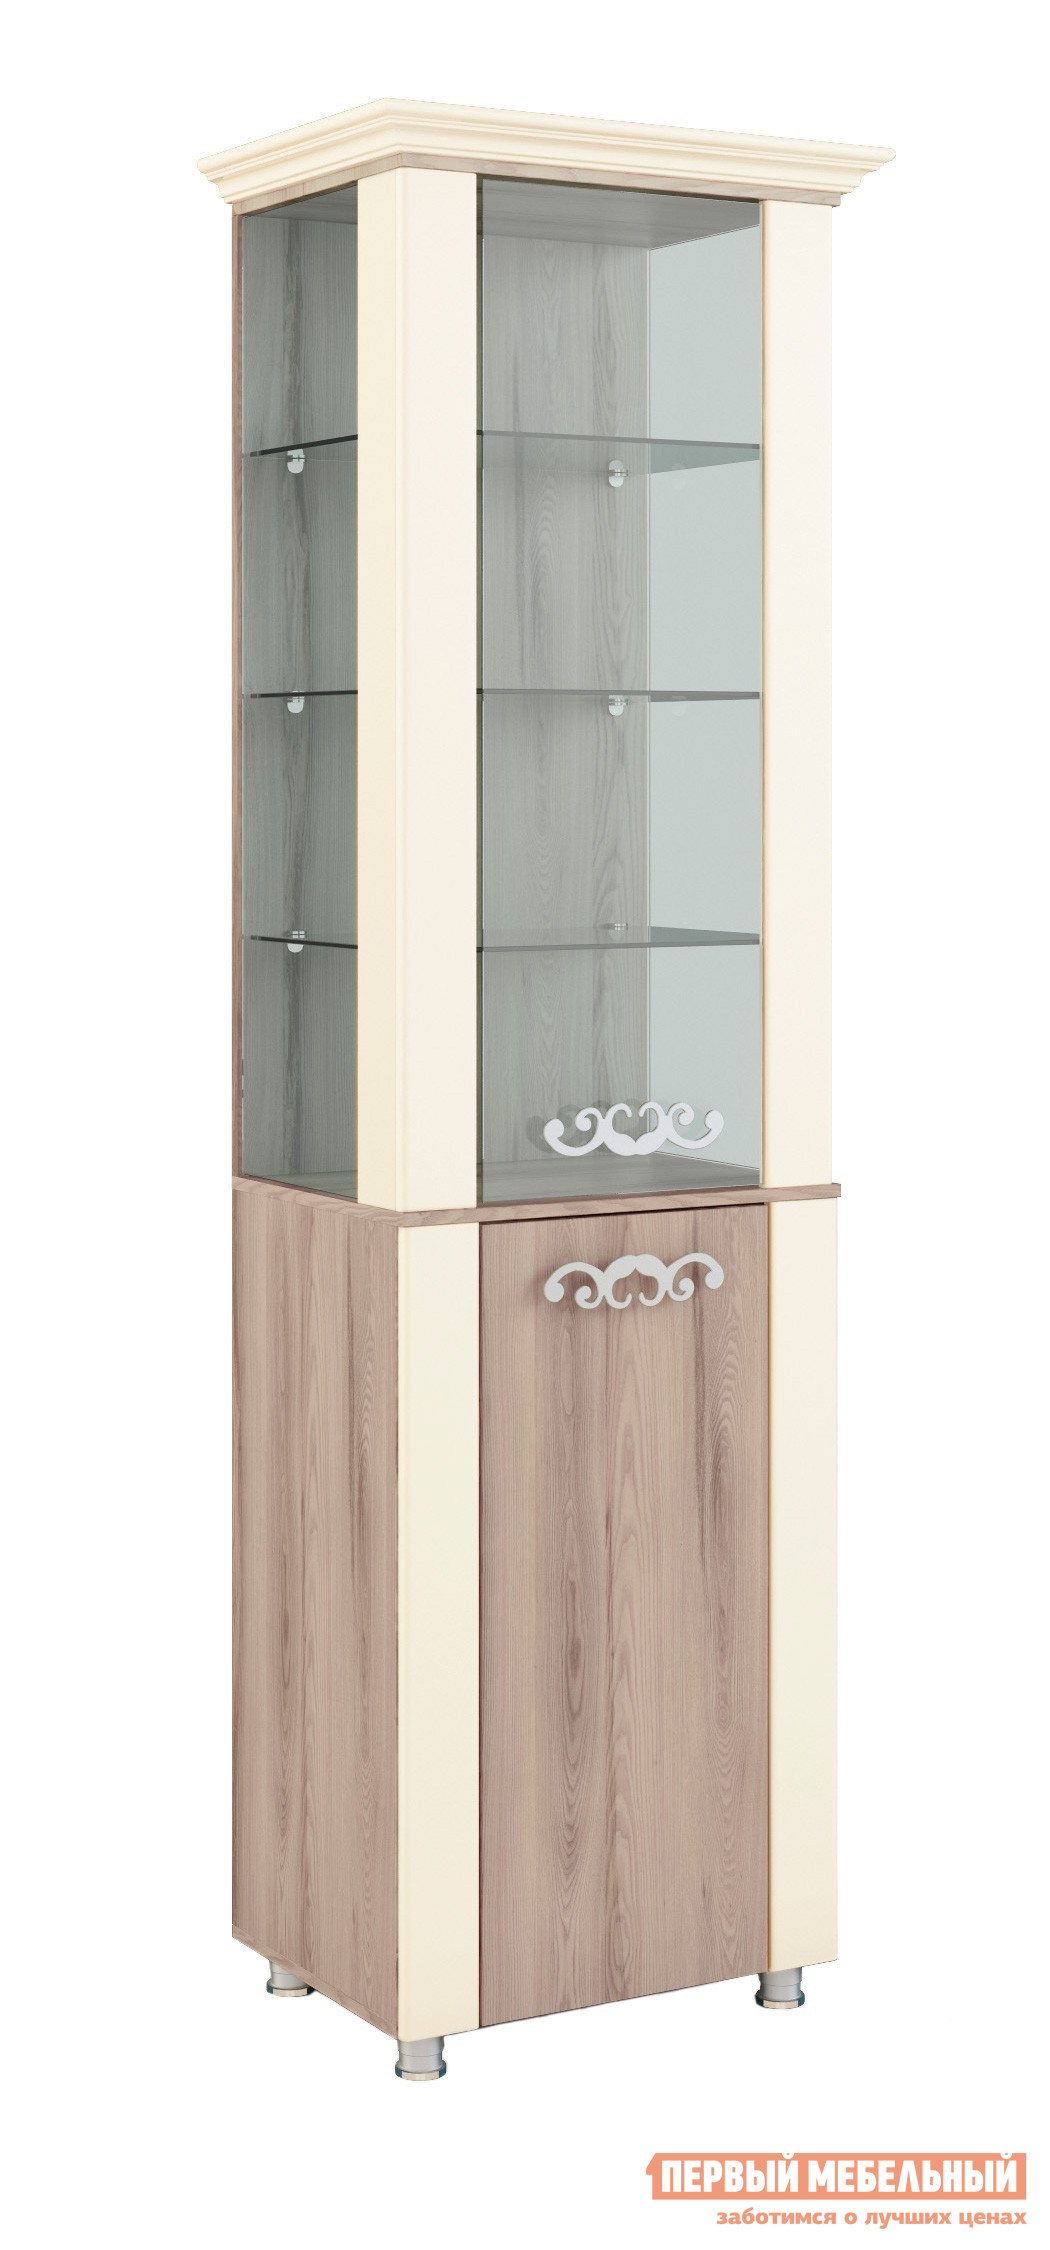 Шкаф-витрина МСТ Натали Шкаф-витрина мод.8 шкаф витрина мебель смоленск шк 07